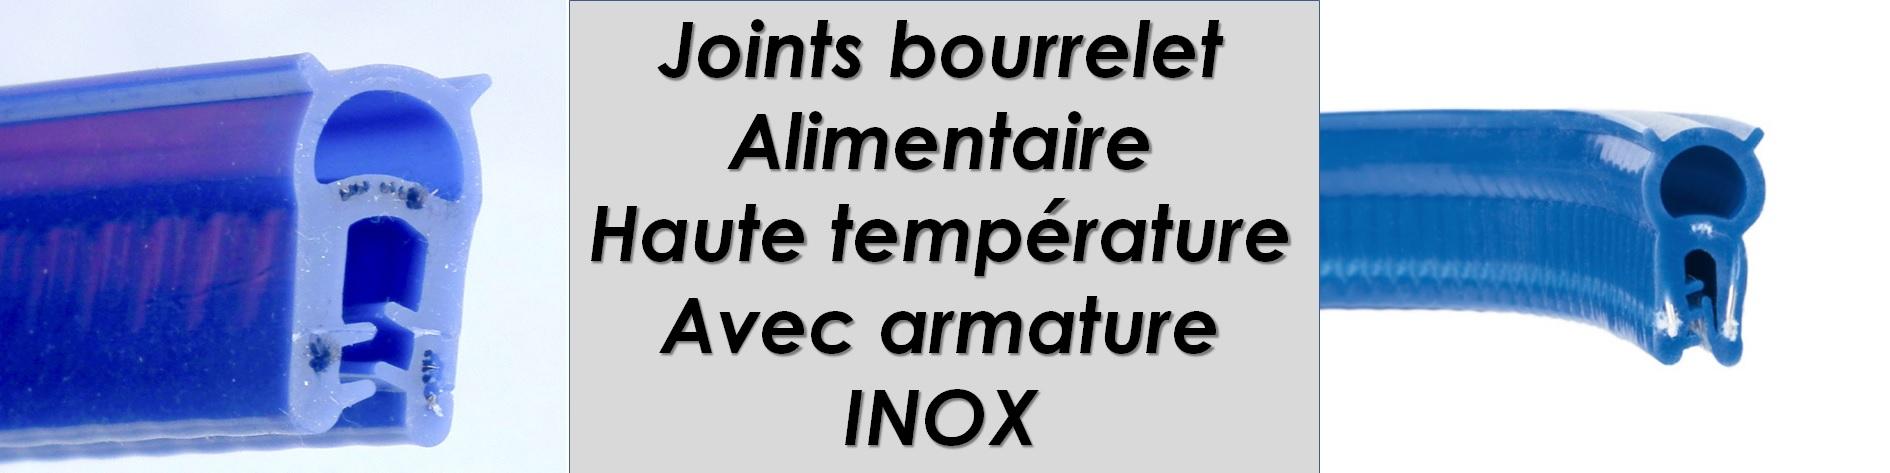 Joint bourrelet tubulaire armature Inox